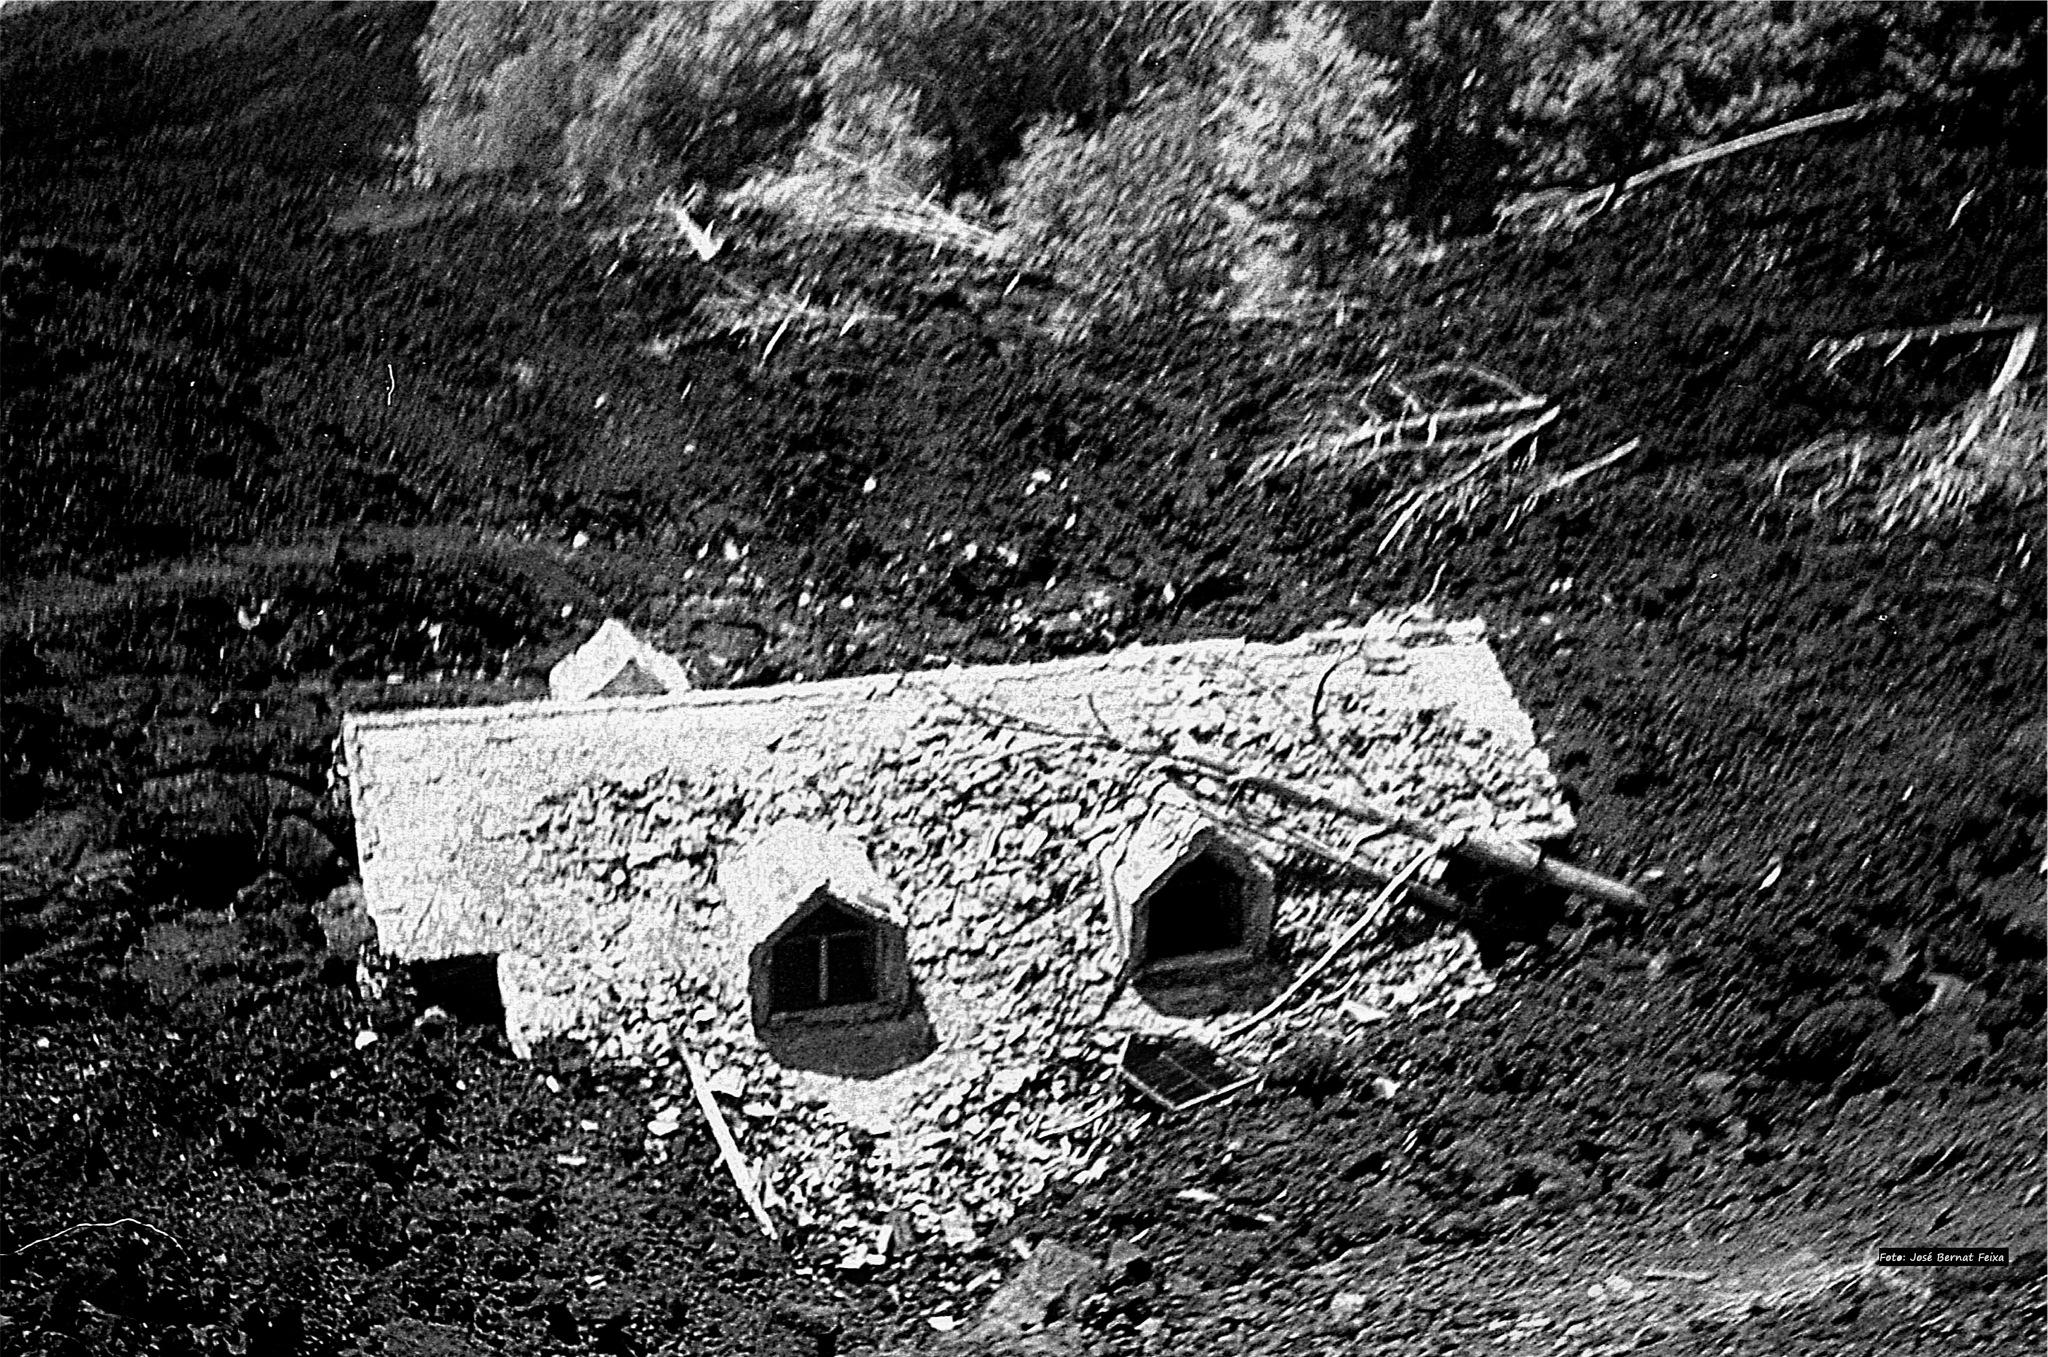 CASA ENTERRADA CON LAVA ; HUIS BEDOLVEN MET LAVA ; HOUSE BURIED WITH LAVA by José Bernat Feixa